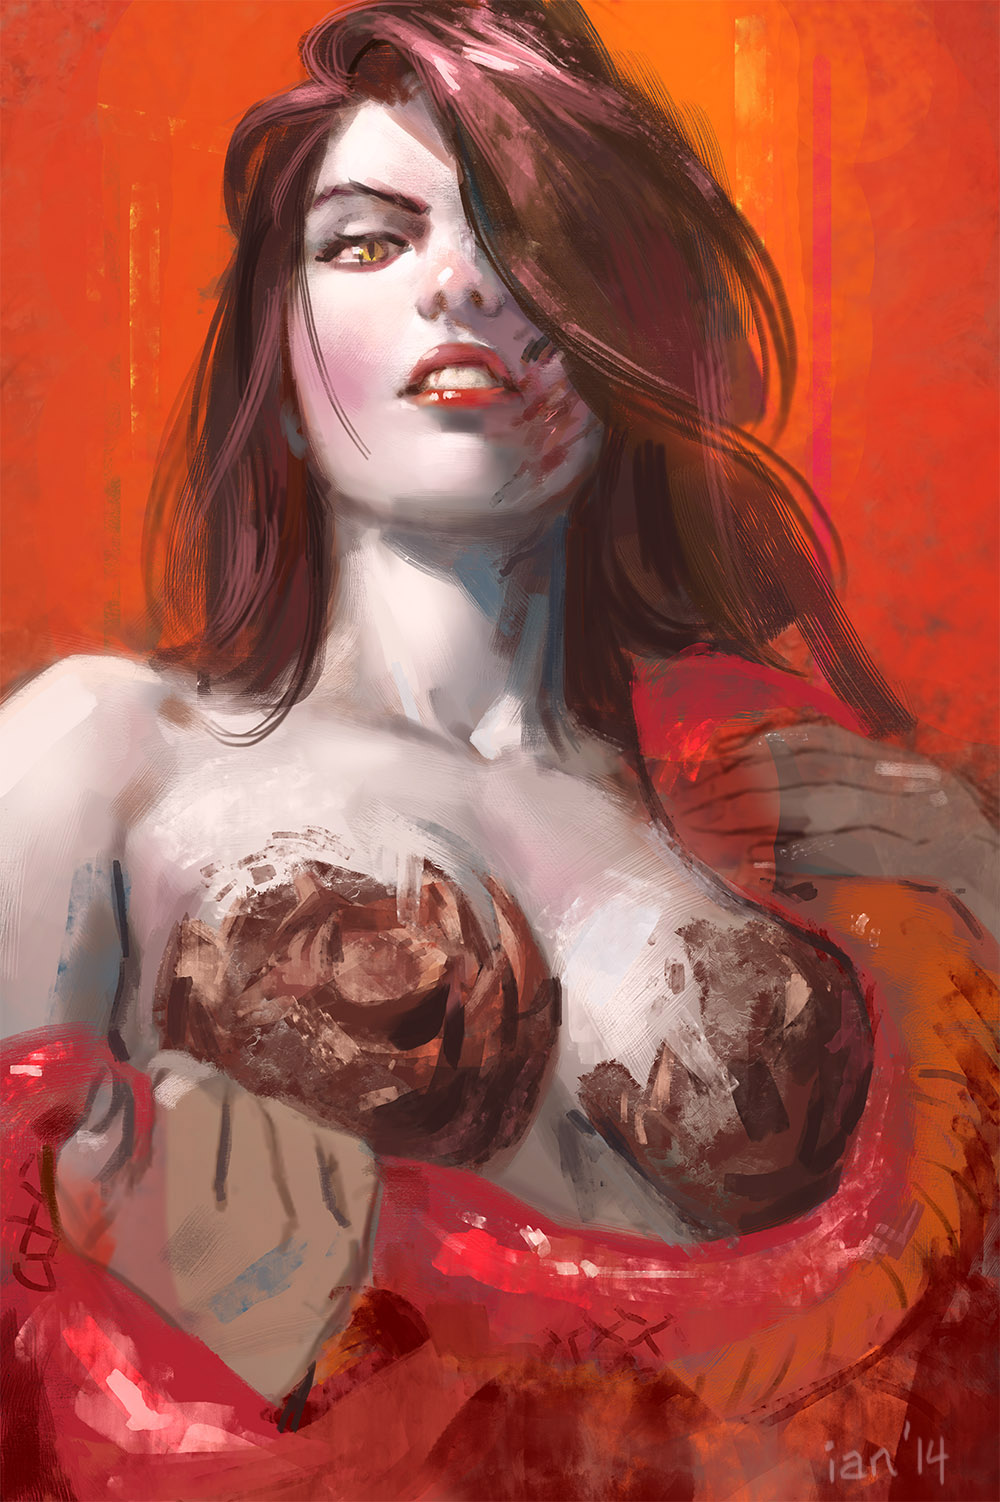 Galeria de Arte: Ficção & Fantasia 1 Lilithredwip_by_bigmac996-d75f8lz